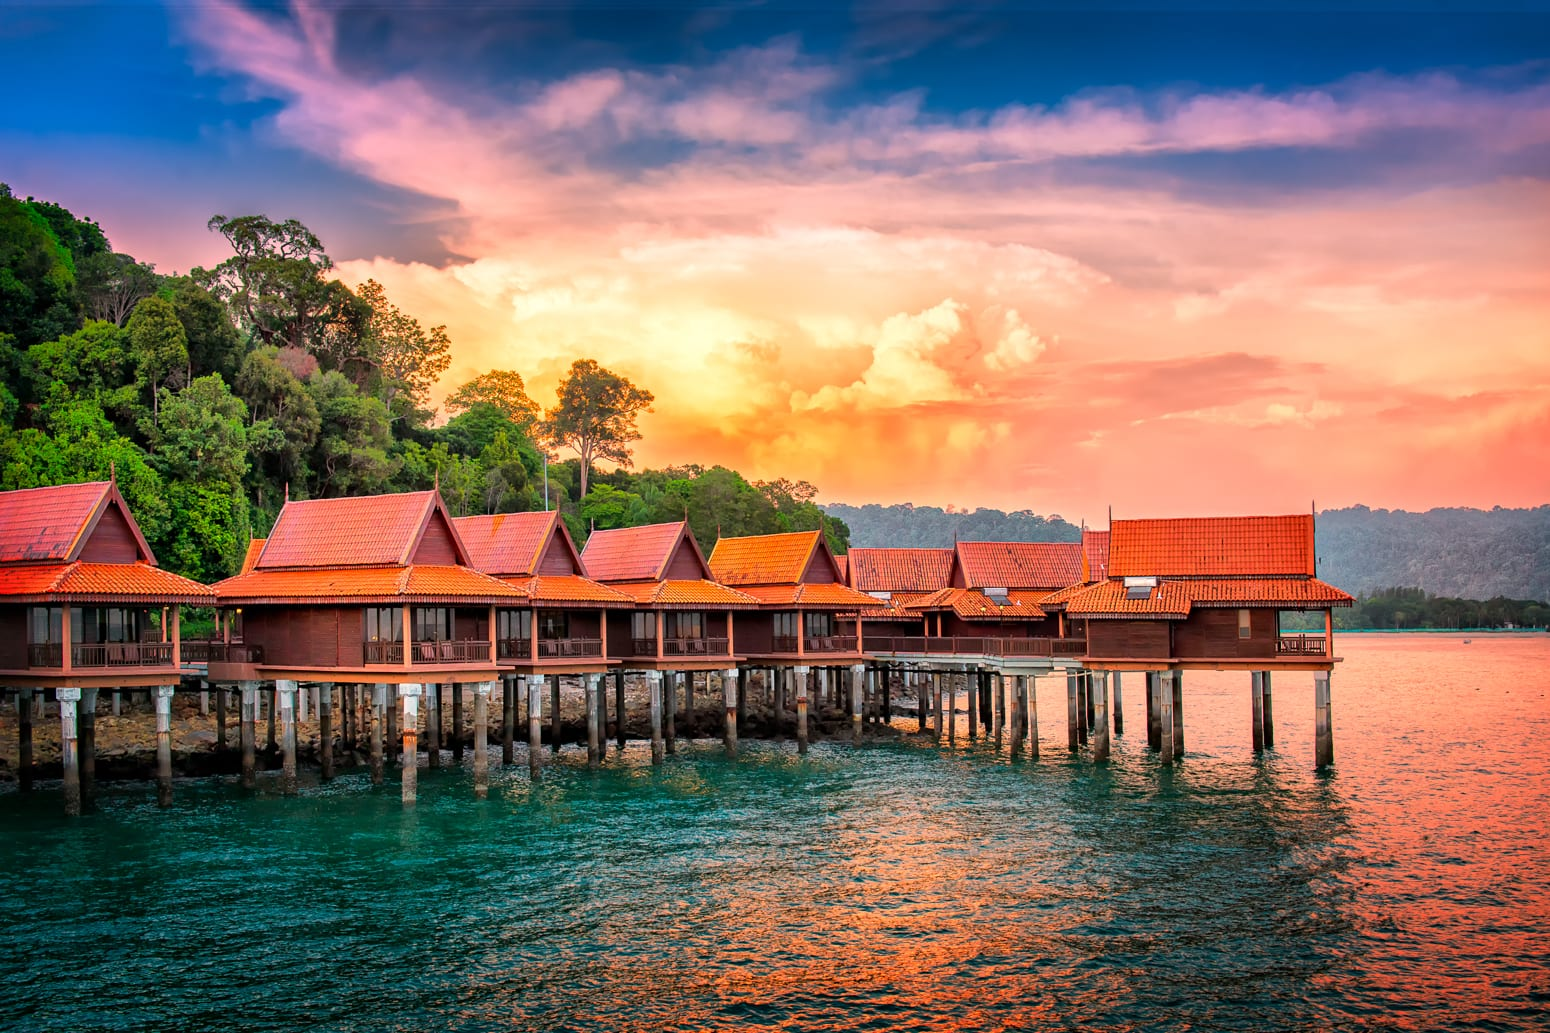 Water chalets in Langkawy, Maleisië. Berjaya Langkawi Resort onder een dramatische hemel.